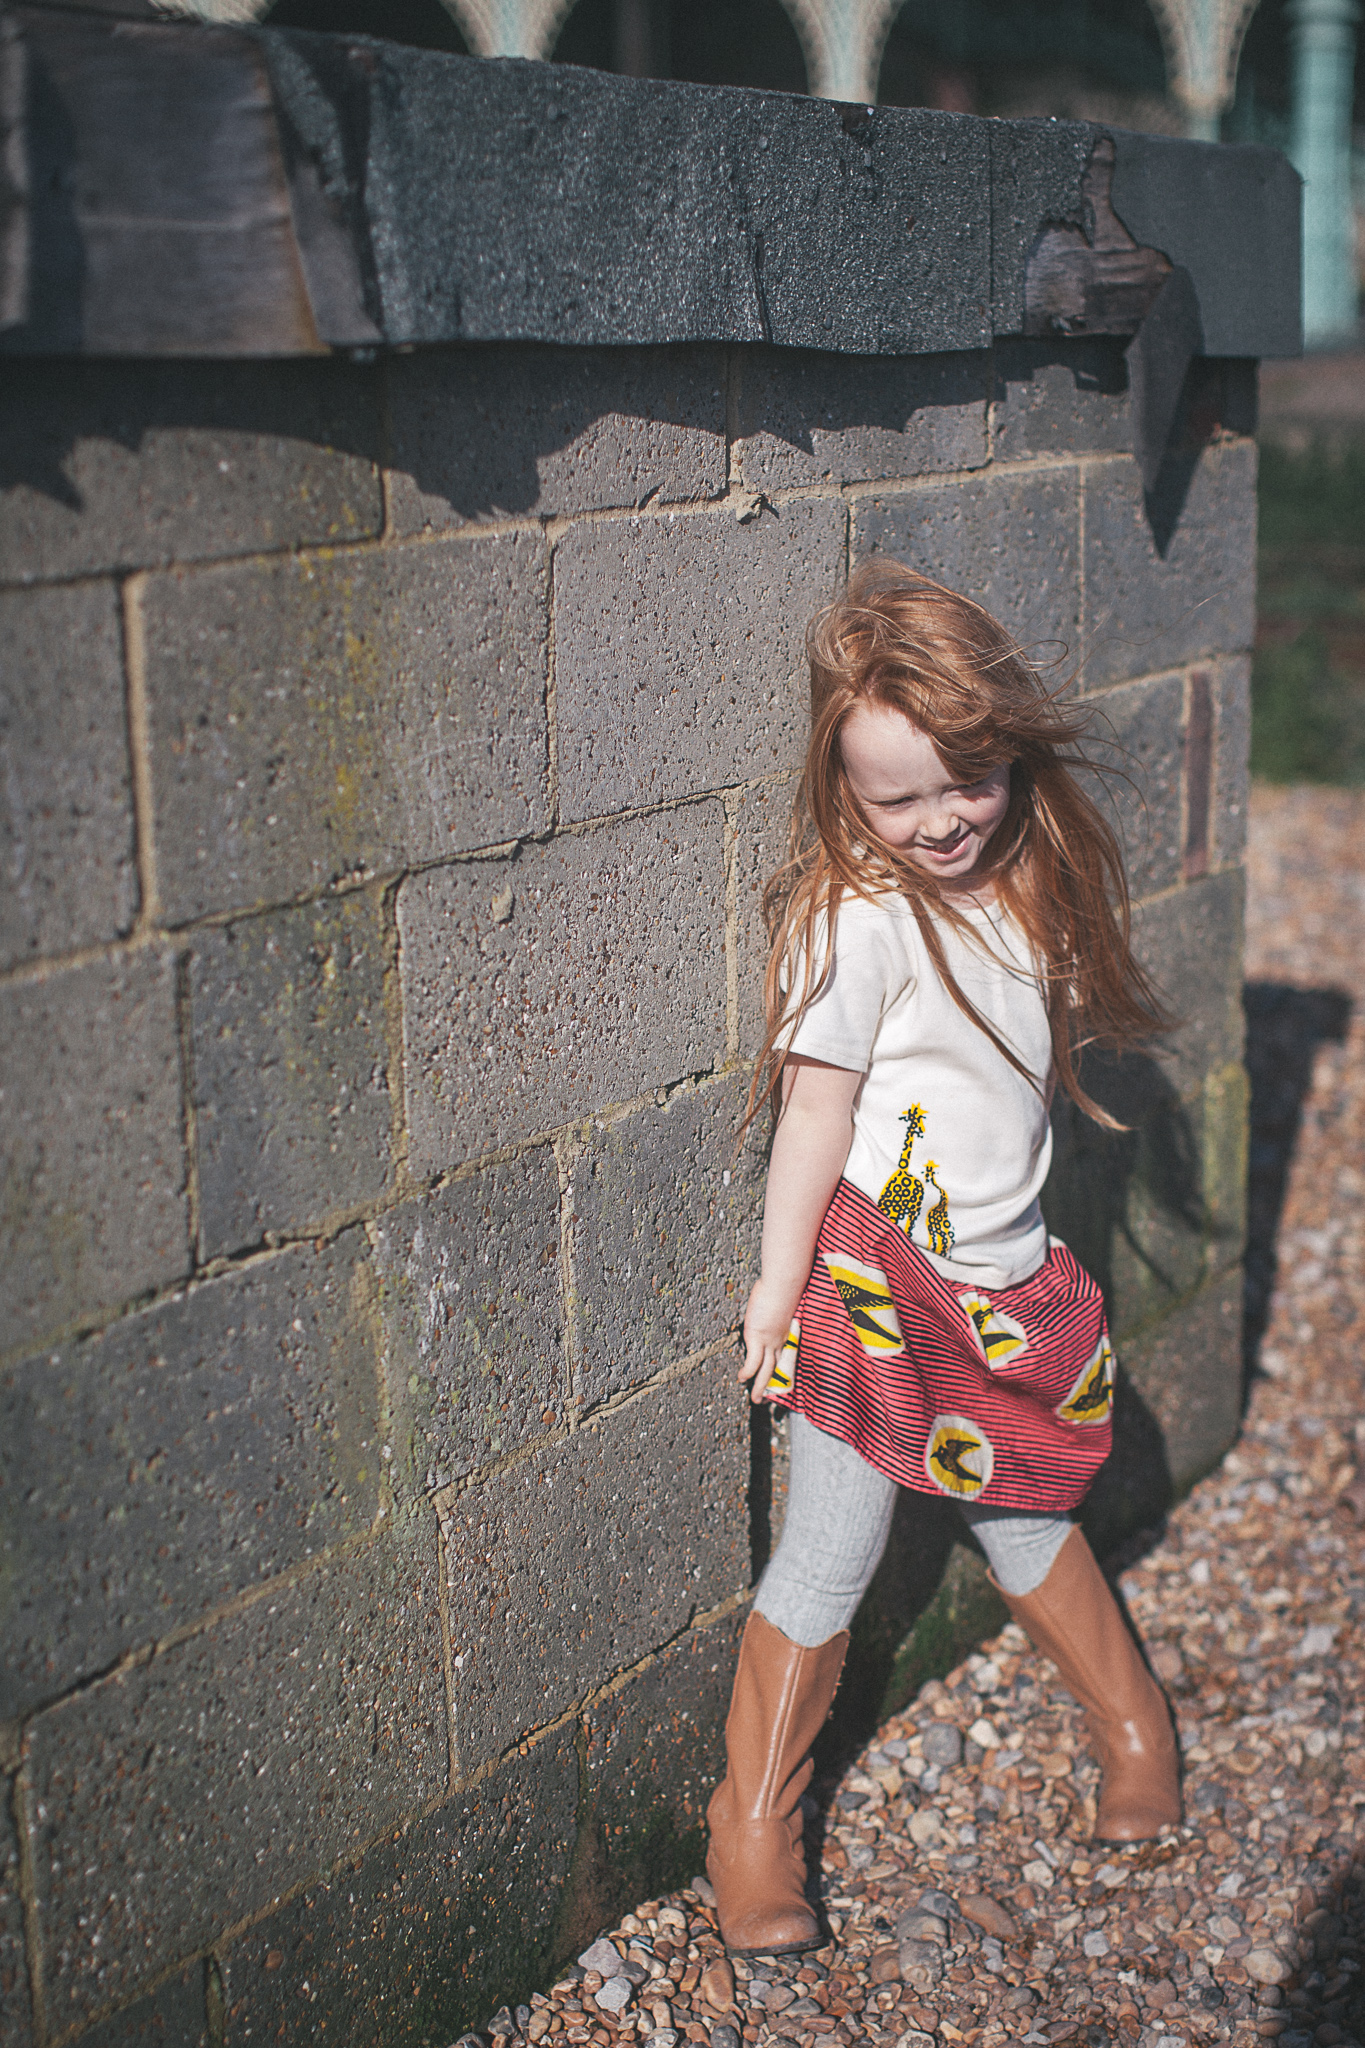 ethical_childrens_clothing_231013_039.jpg